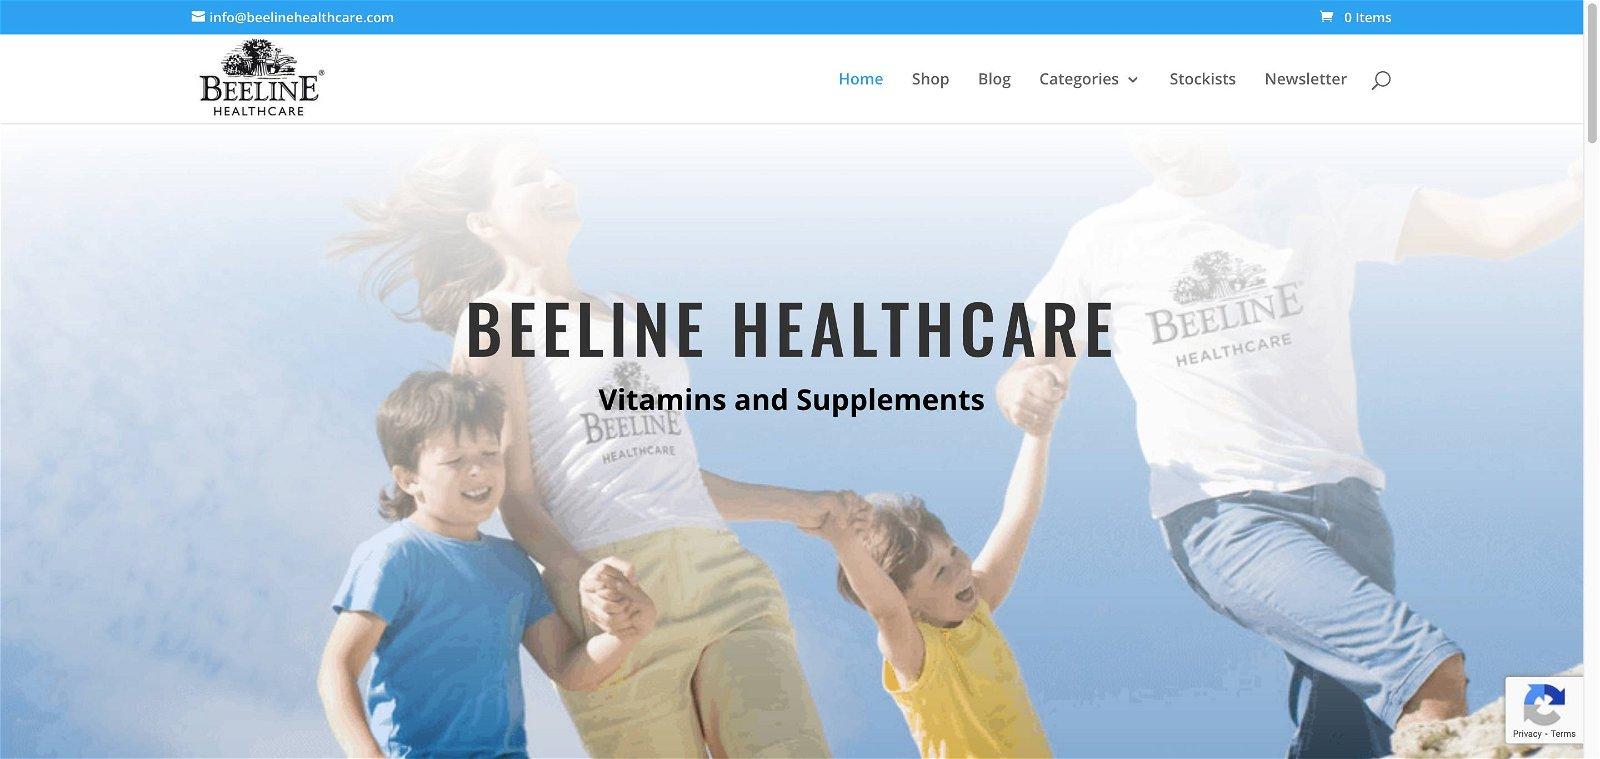 Beeline healthcare.com 1